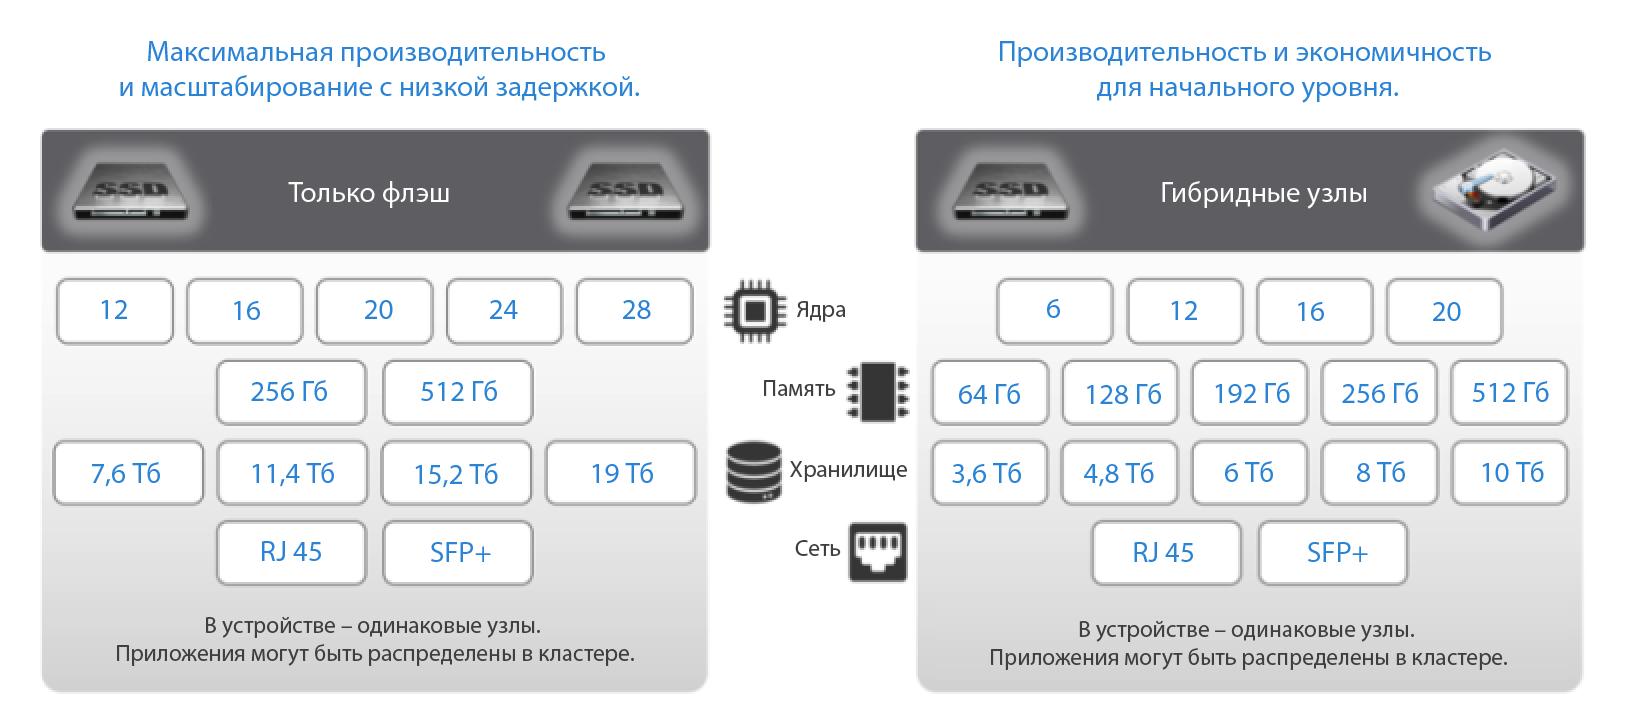 VxRail — гиперконвергентная СХД на все времена - 6